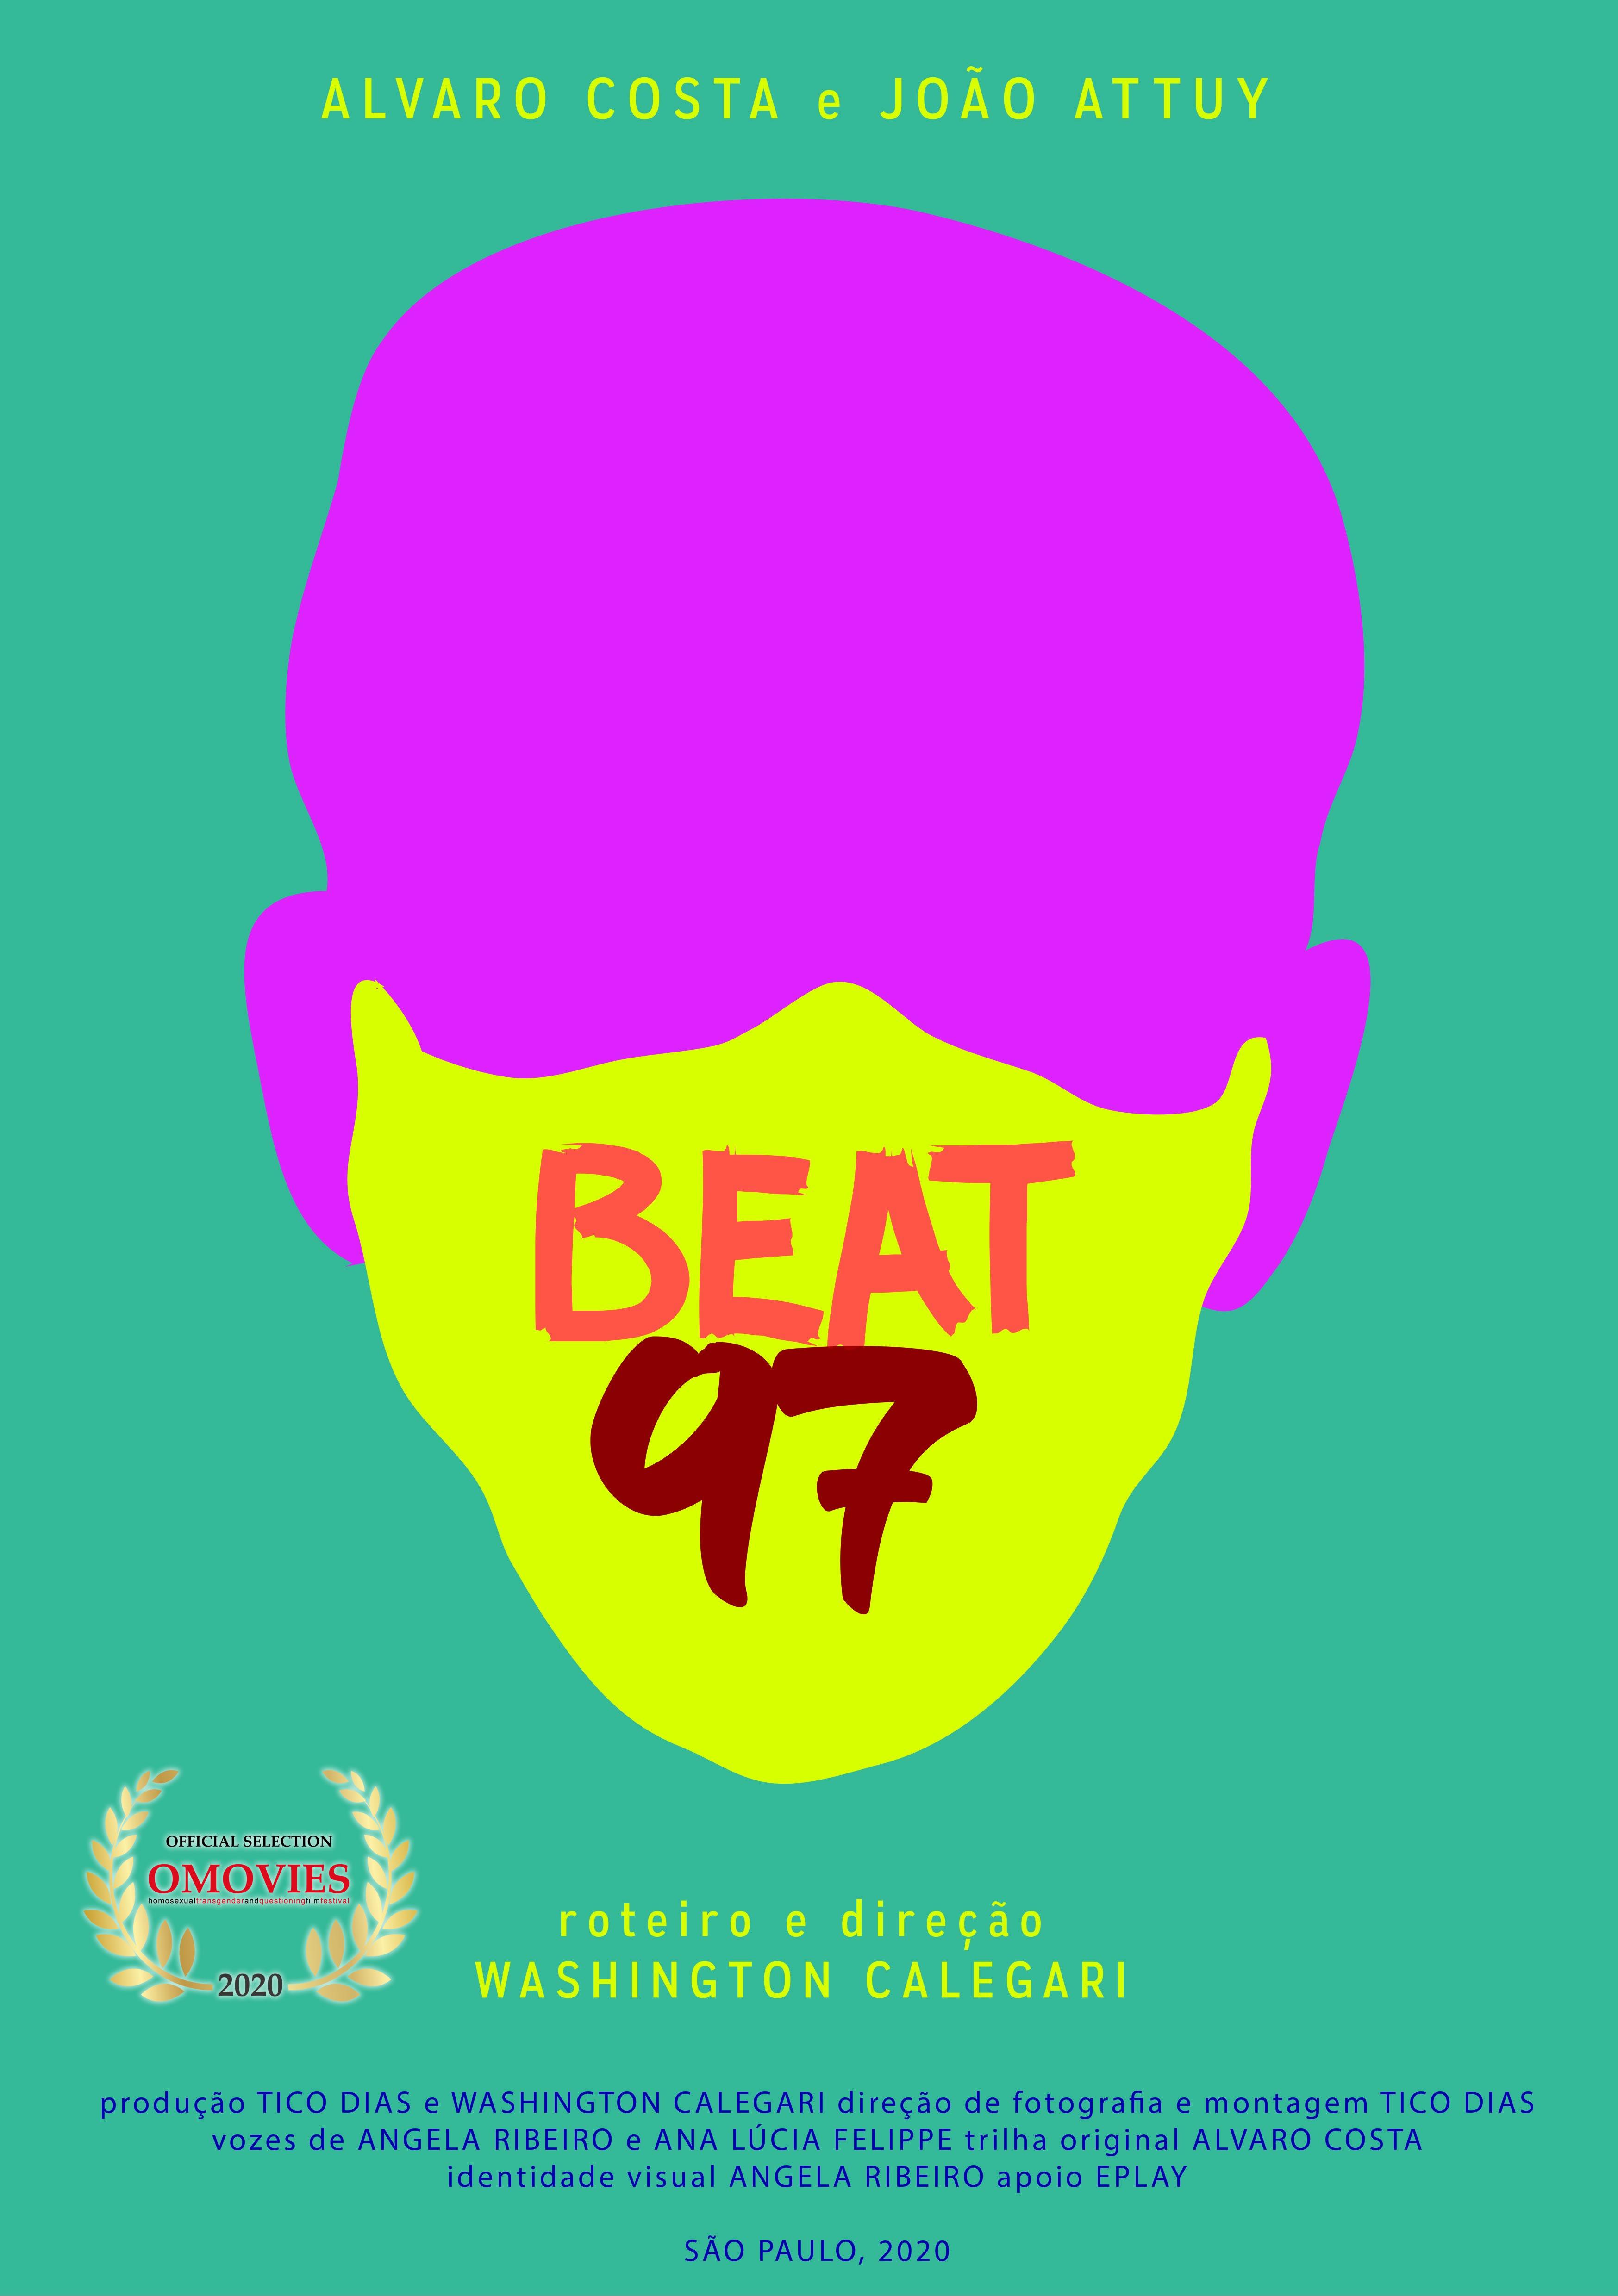 Beat 97 – DirectorWashington Calegari Dec 22